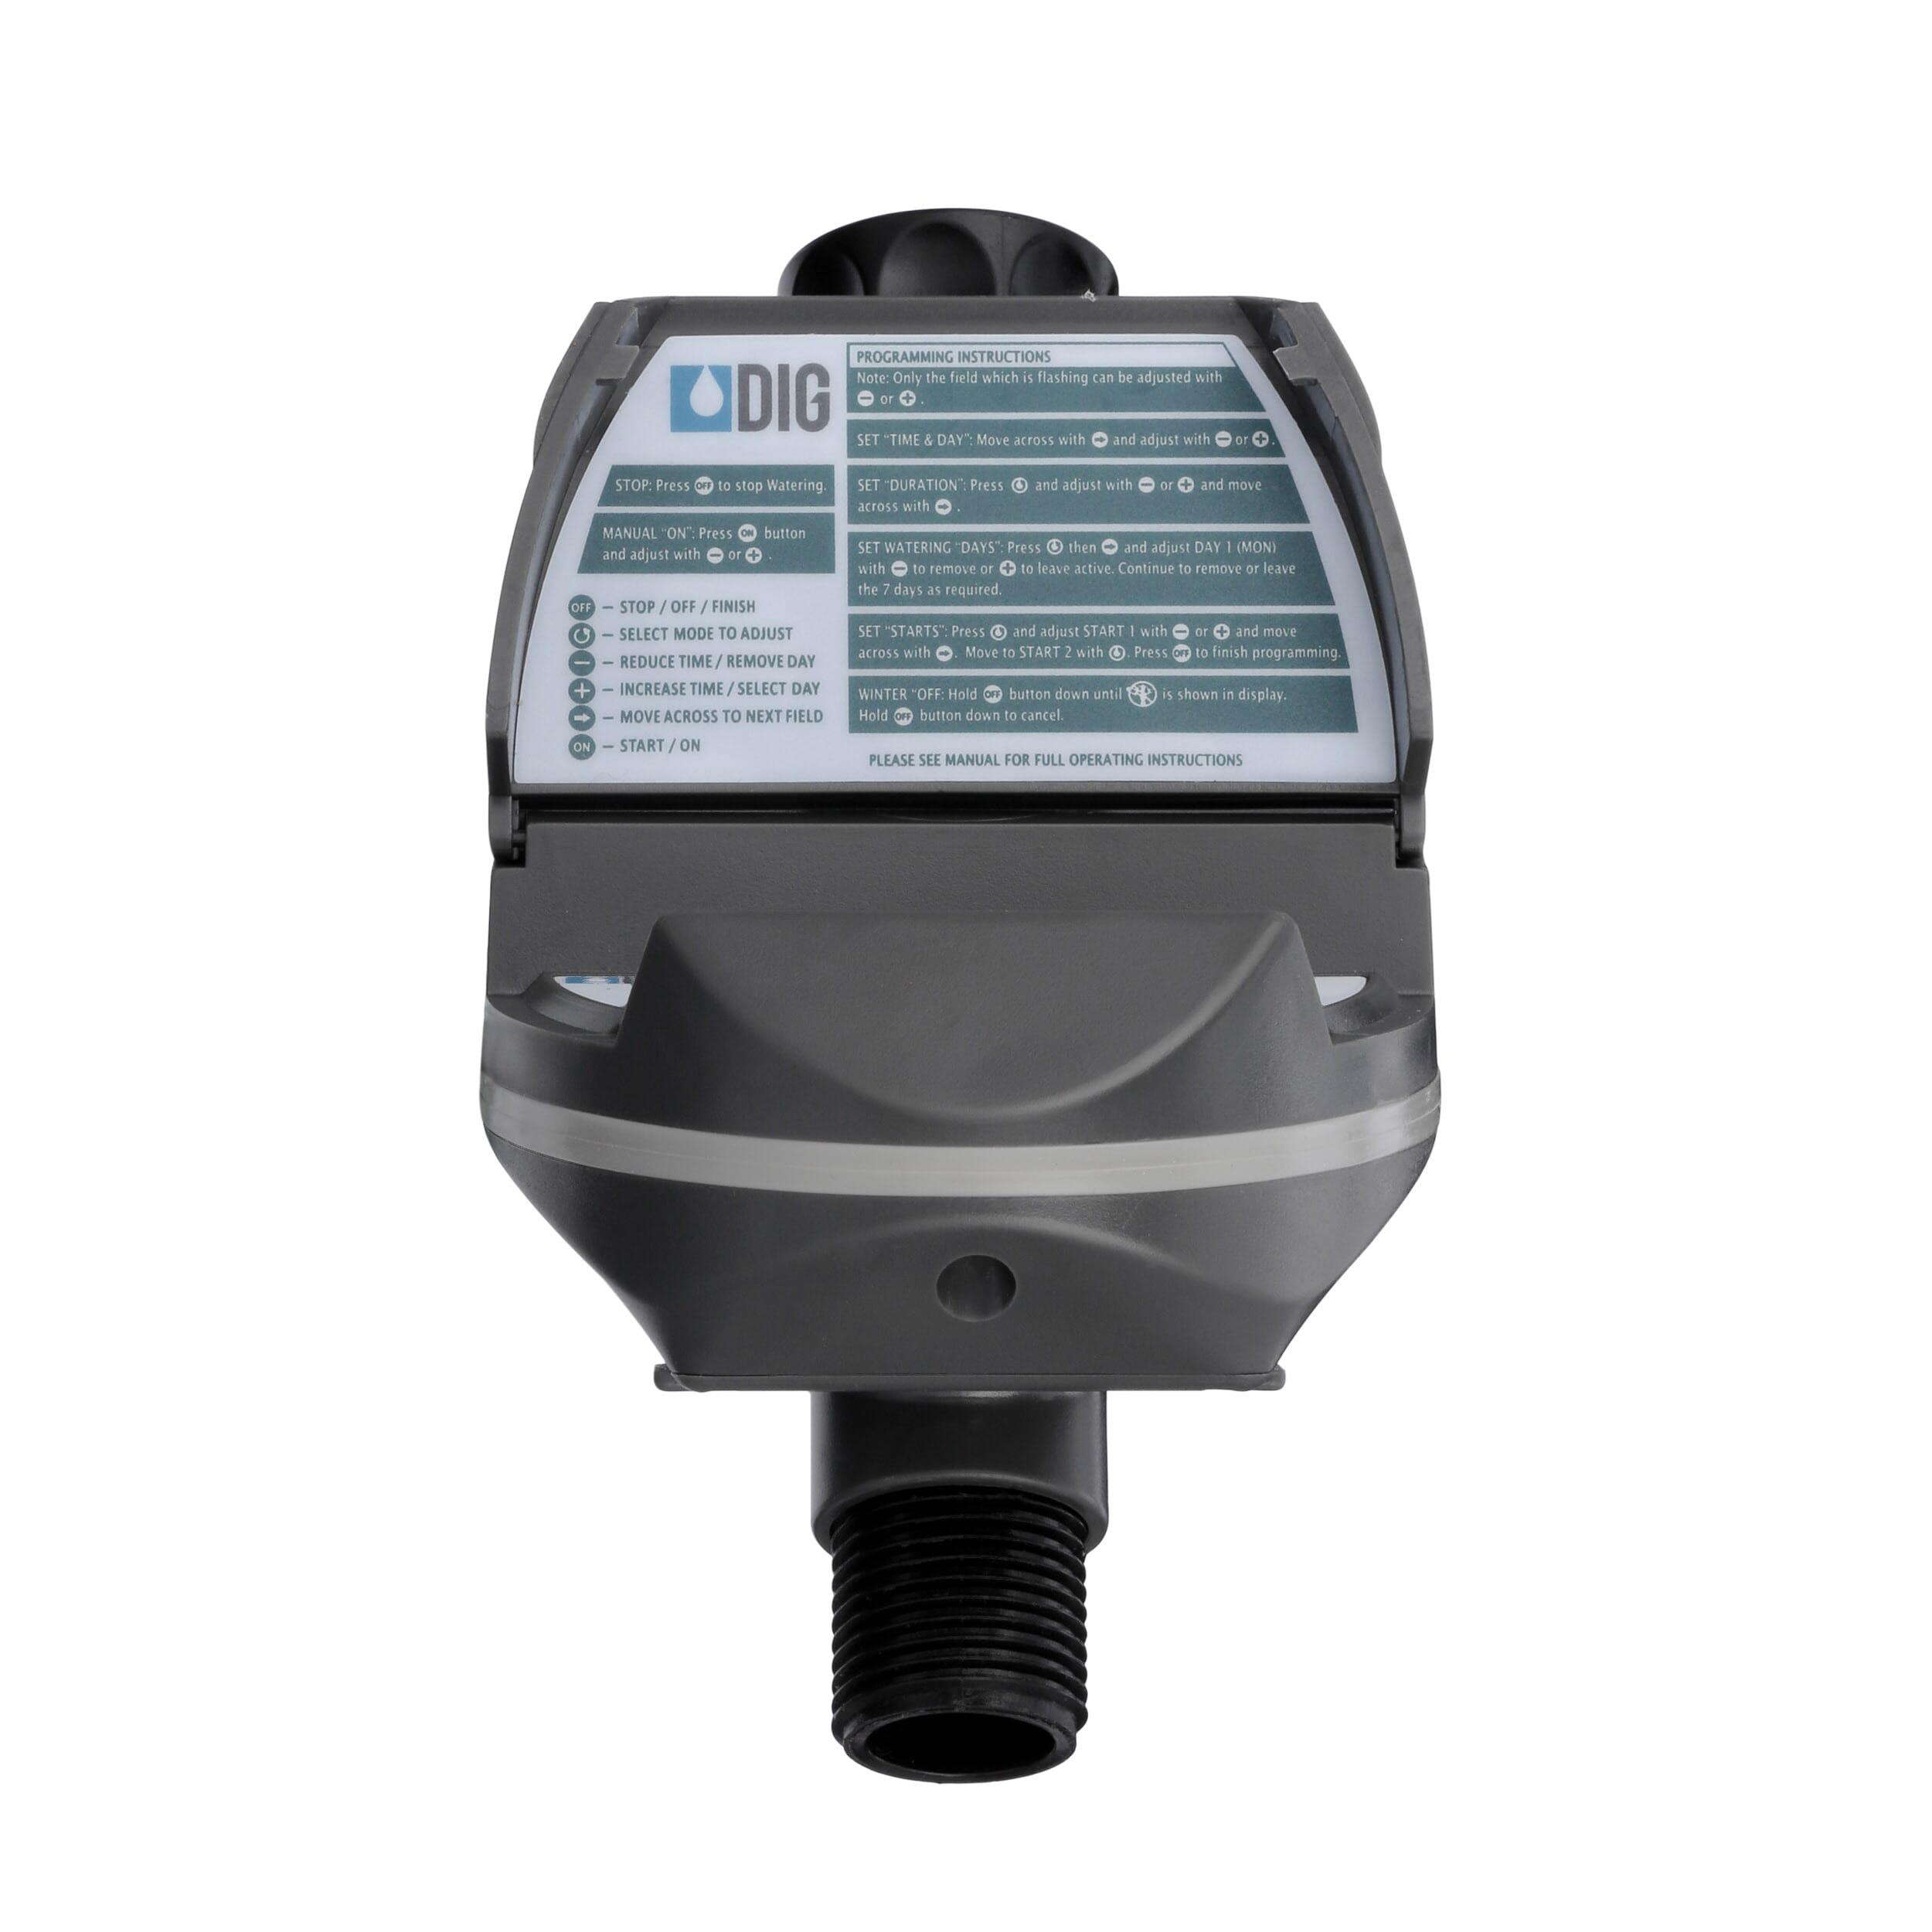 DIG Digital Hose Thread Watering Timer-BO9DB - The Home Depot